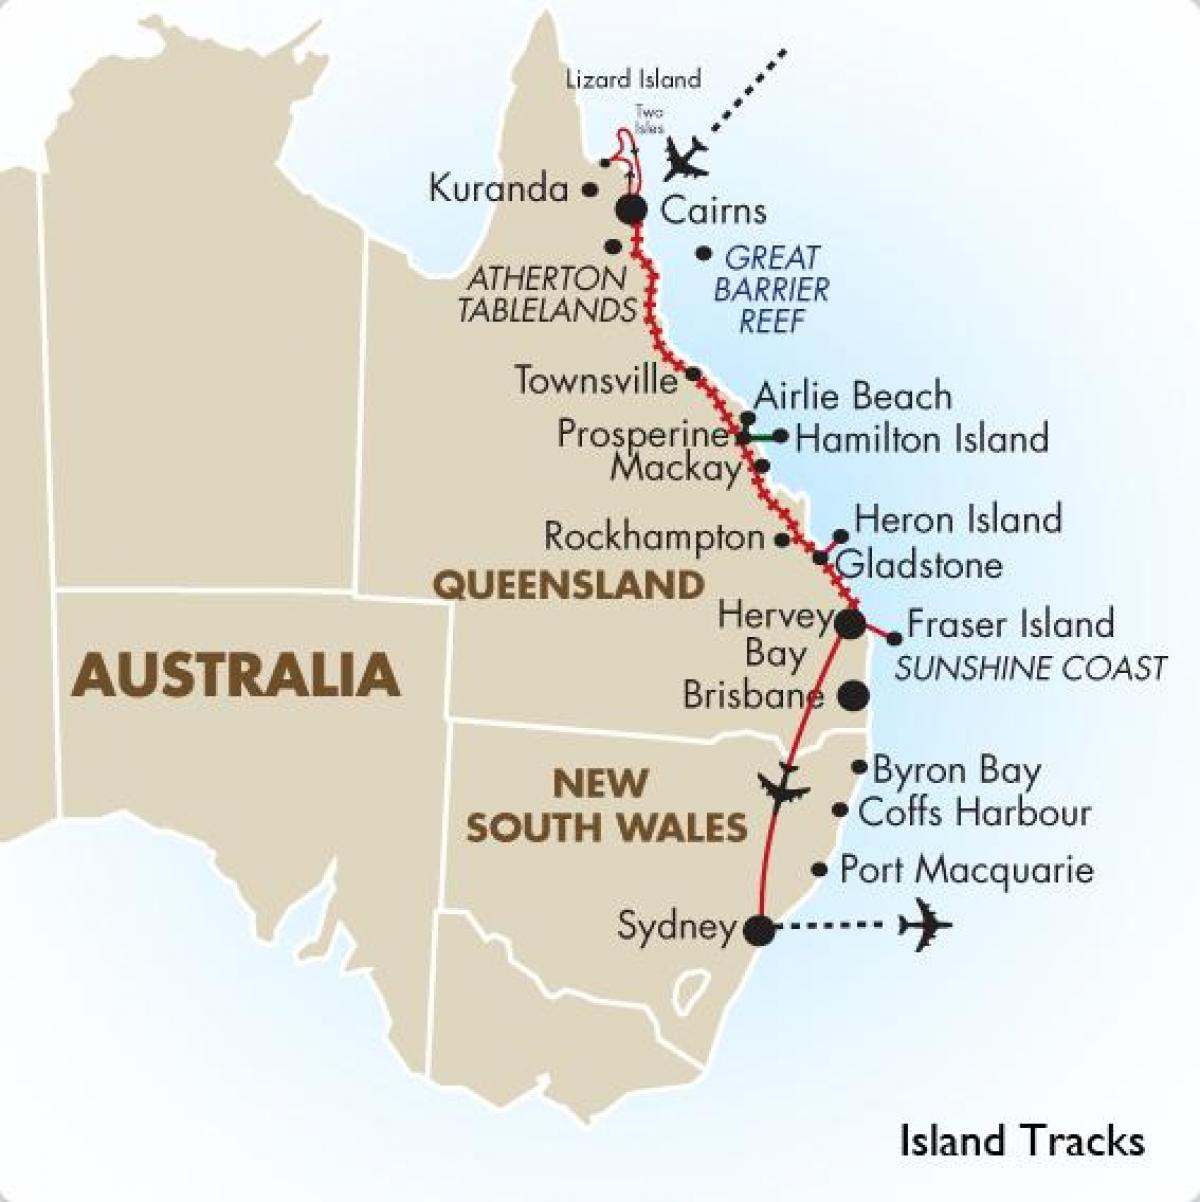 Map East Coast Of Australia.Australian East Coast Map Map Of East Coast Of Australia